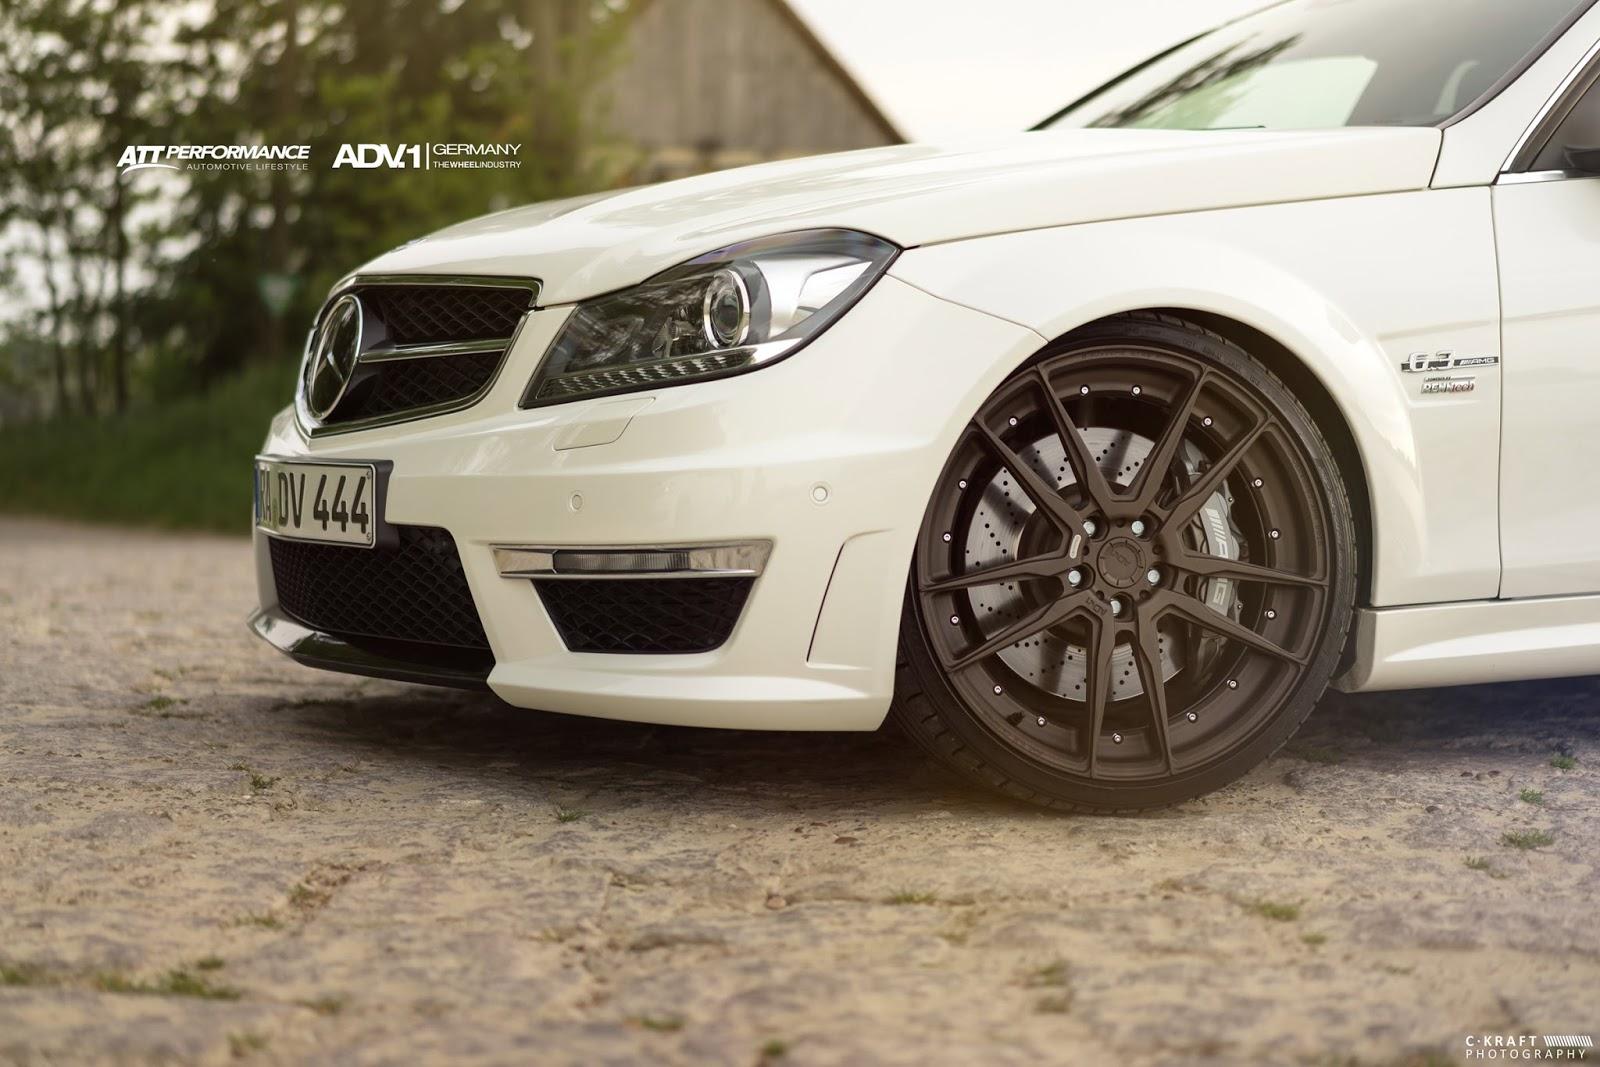 Amg G Wagon >> Mercedes-Benz S204 C63 AMG on ADV5.2 MV2 Wheels   BENZTUNING